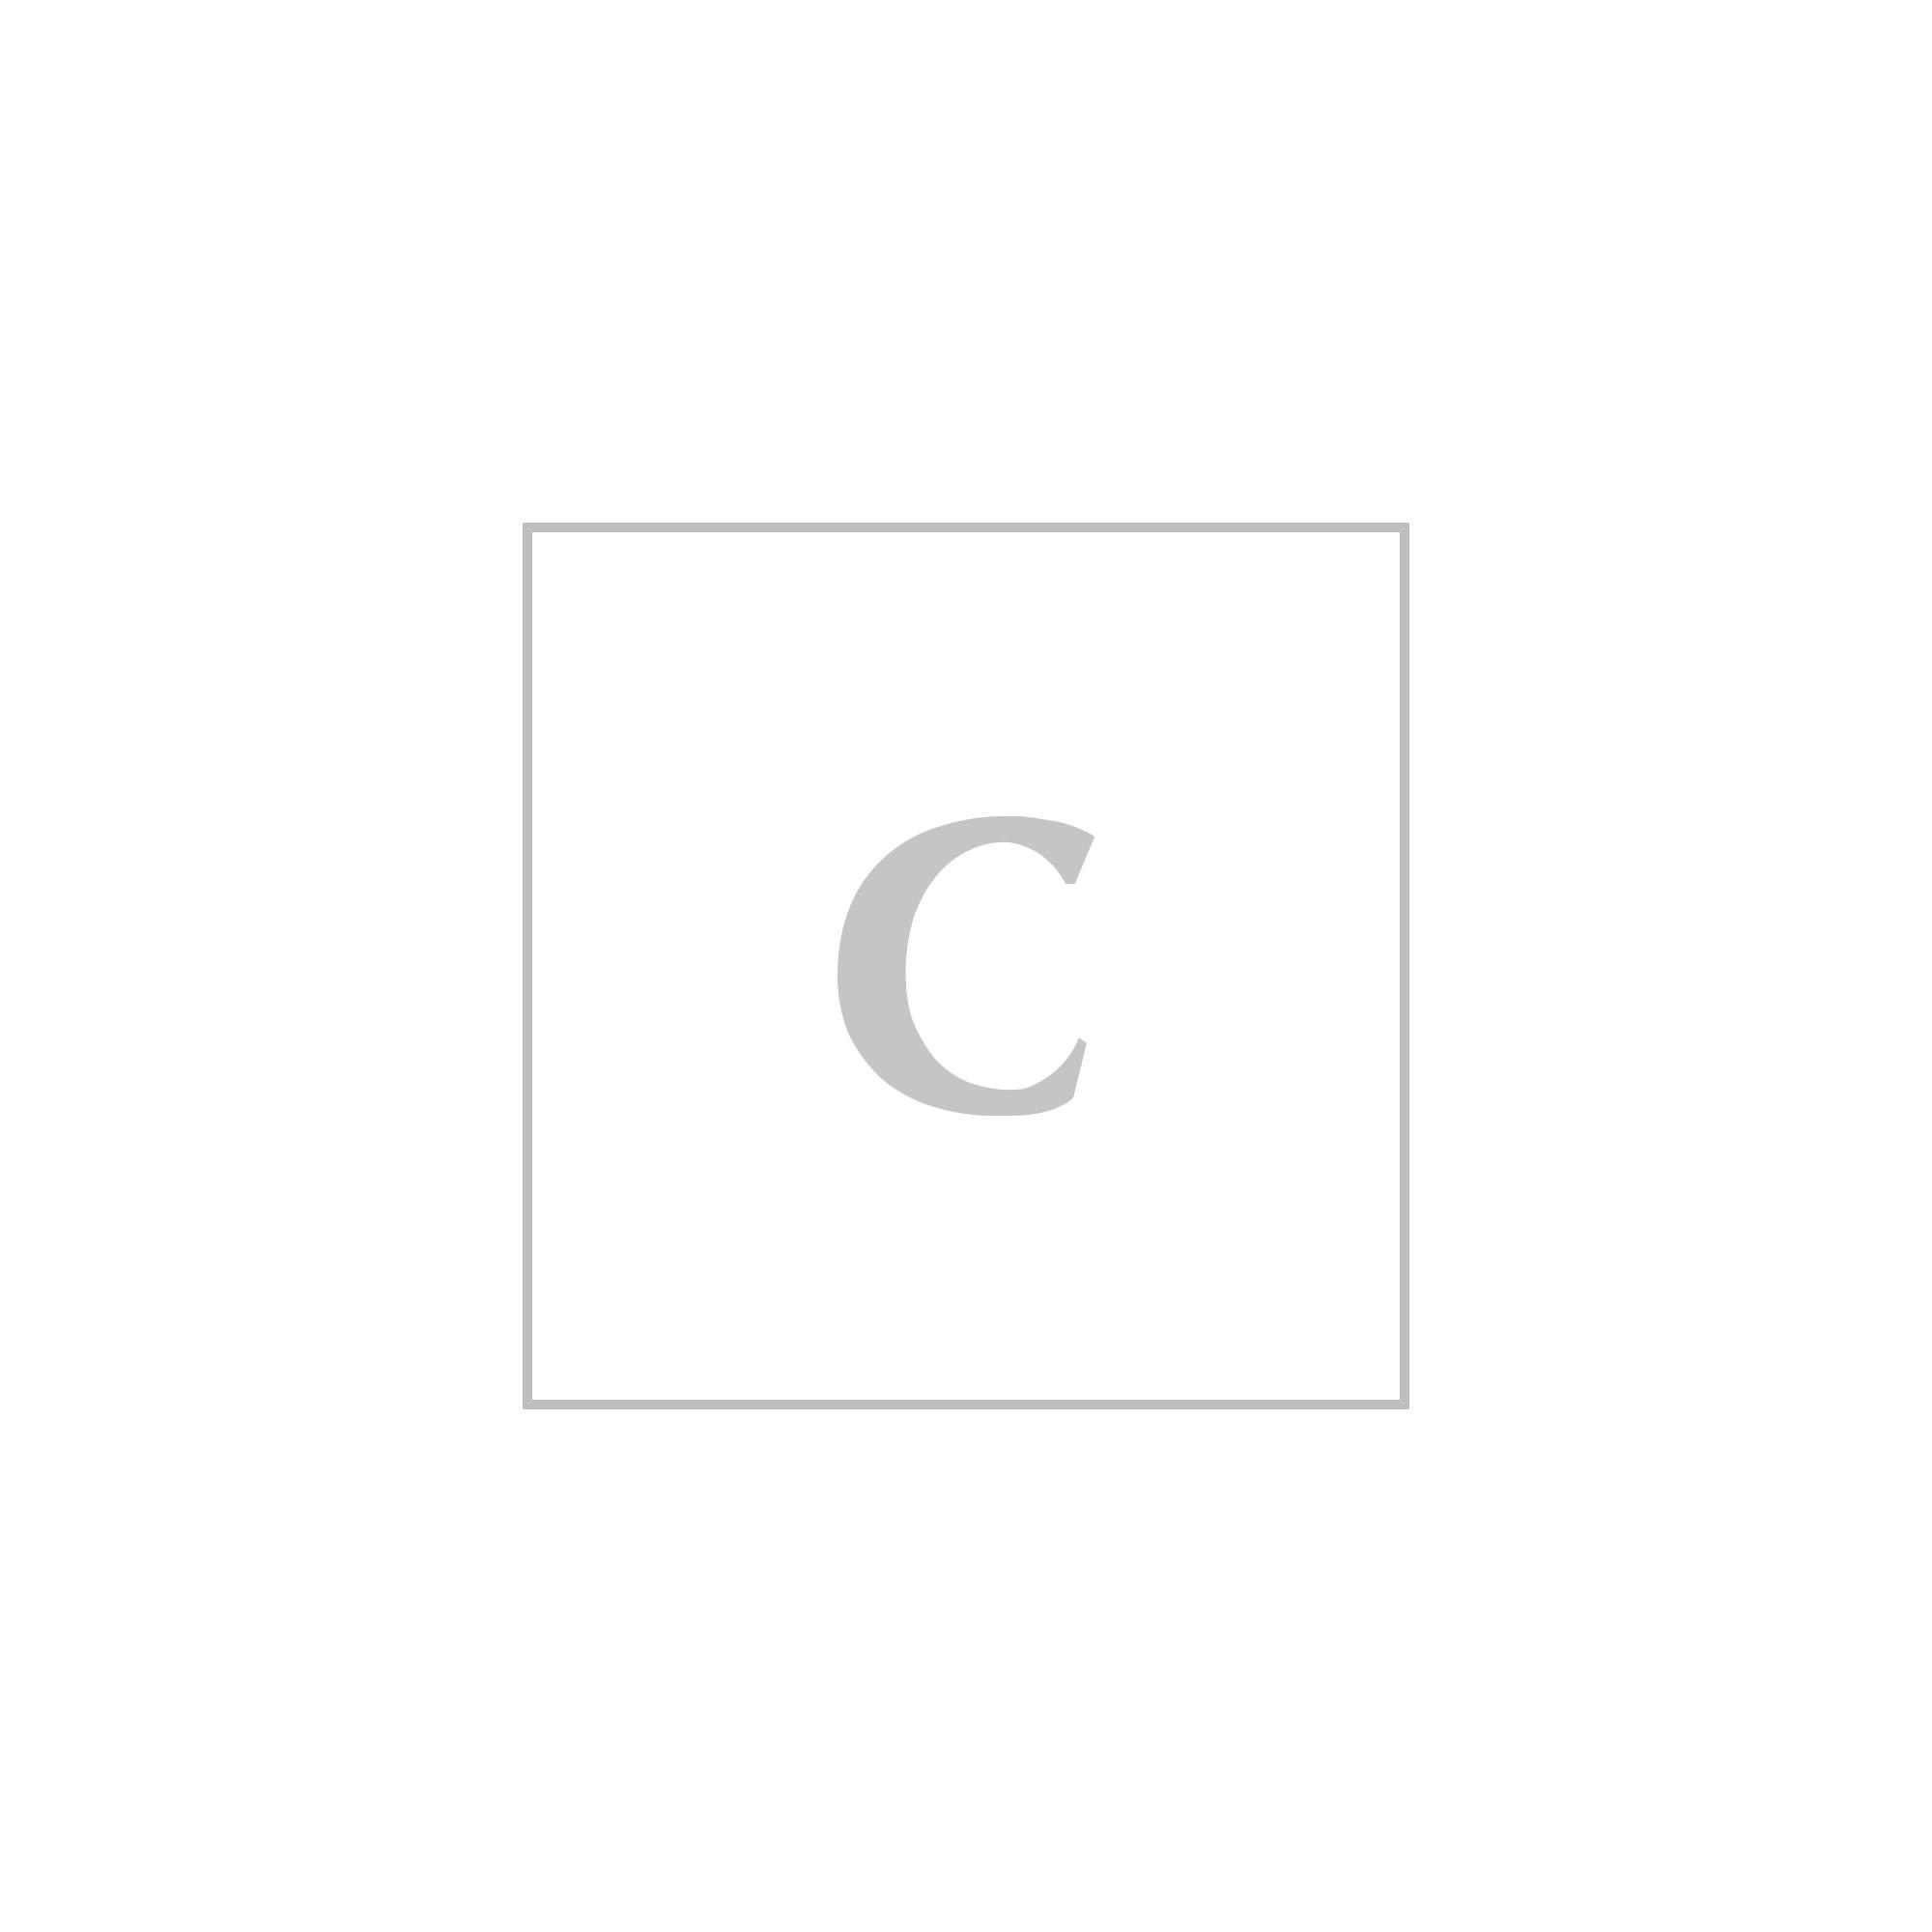 Christian Dior p.foglio miss dior cannage lambskin